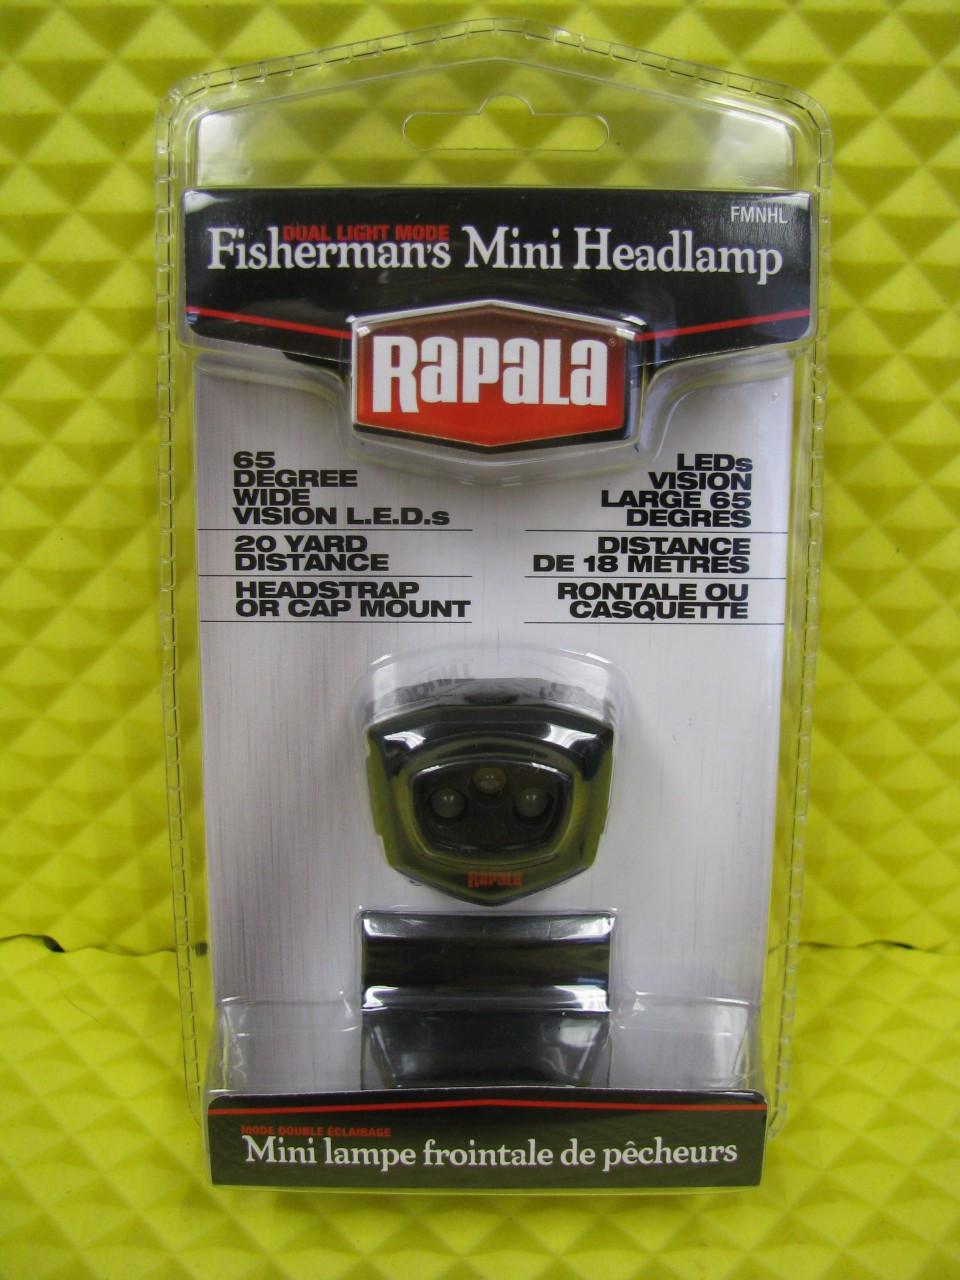 RAPALA FISHERMAN'S MINI HEADLAMP #FMNHL